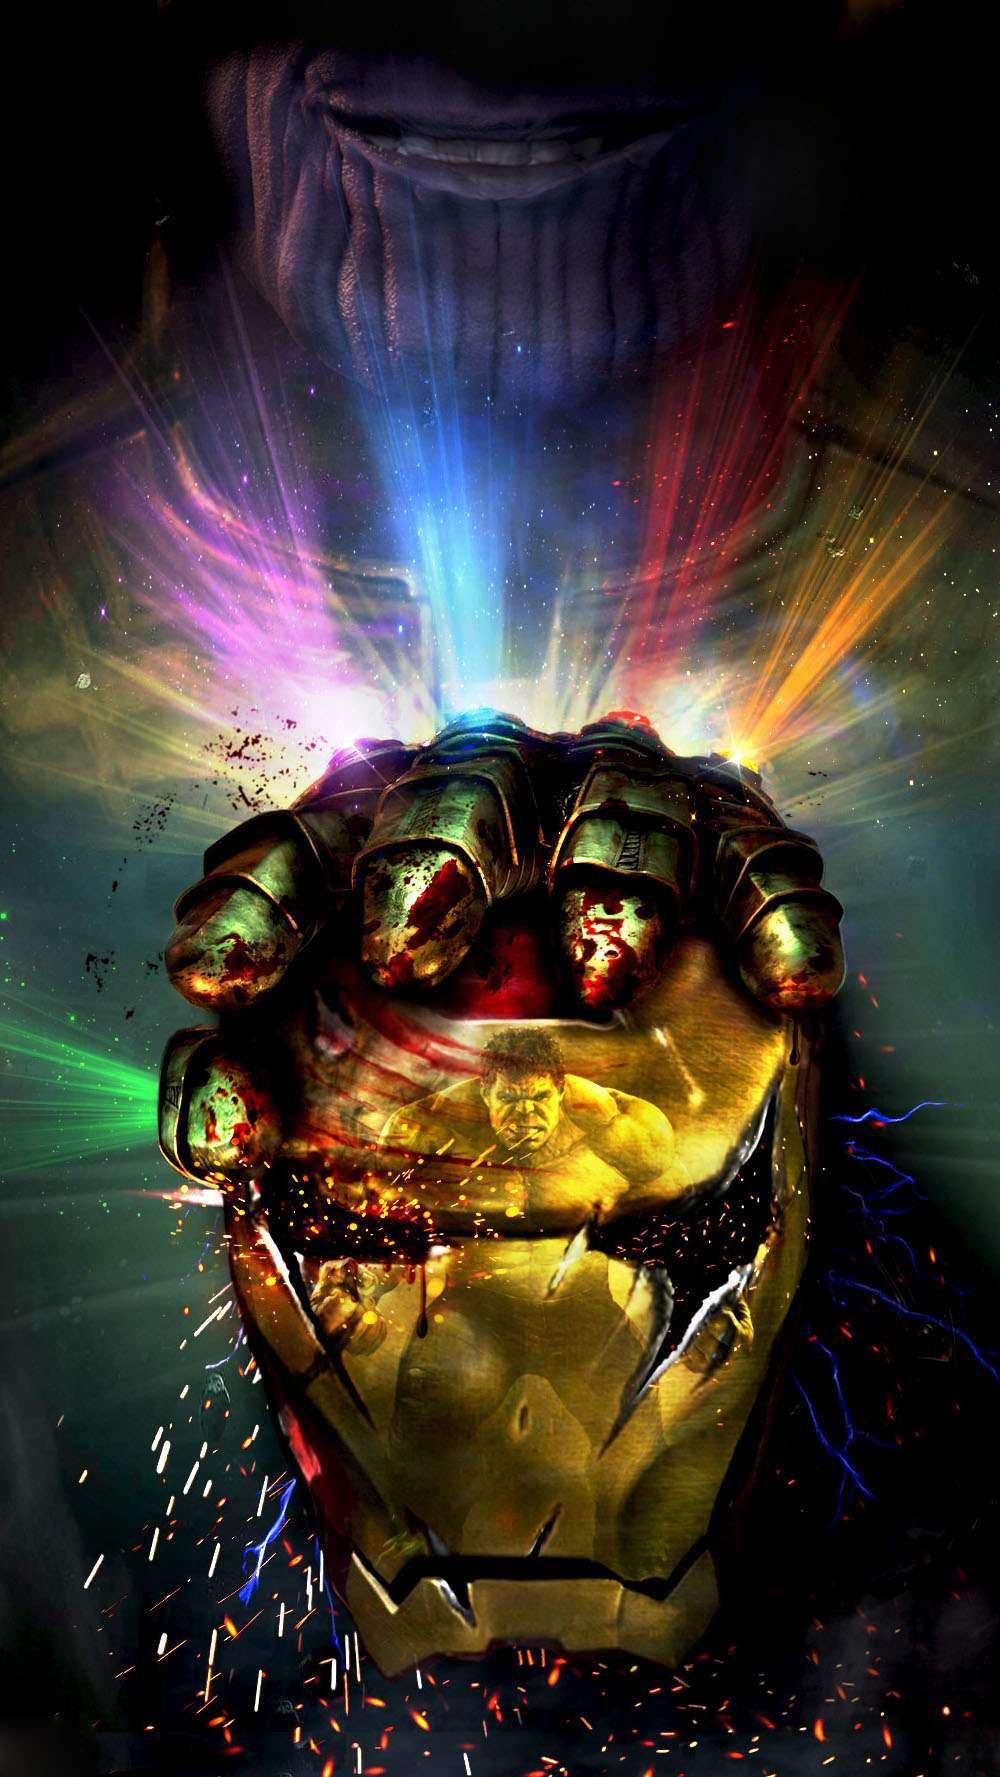 Endgame Thanos vs Ironman iPhone Wallpaper